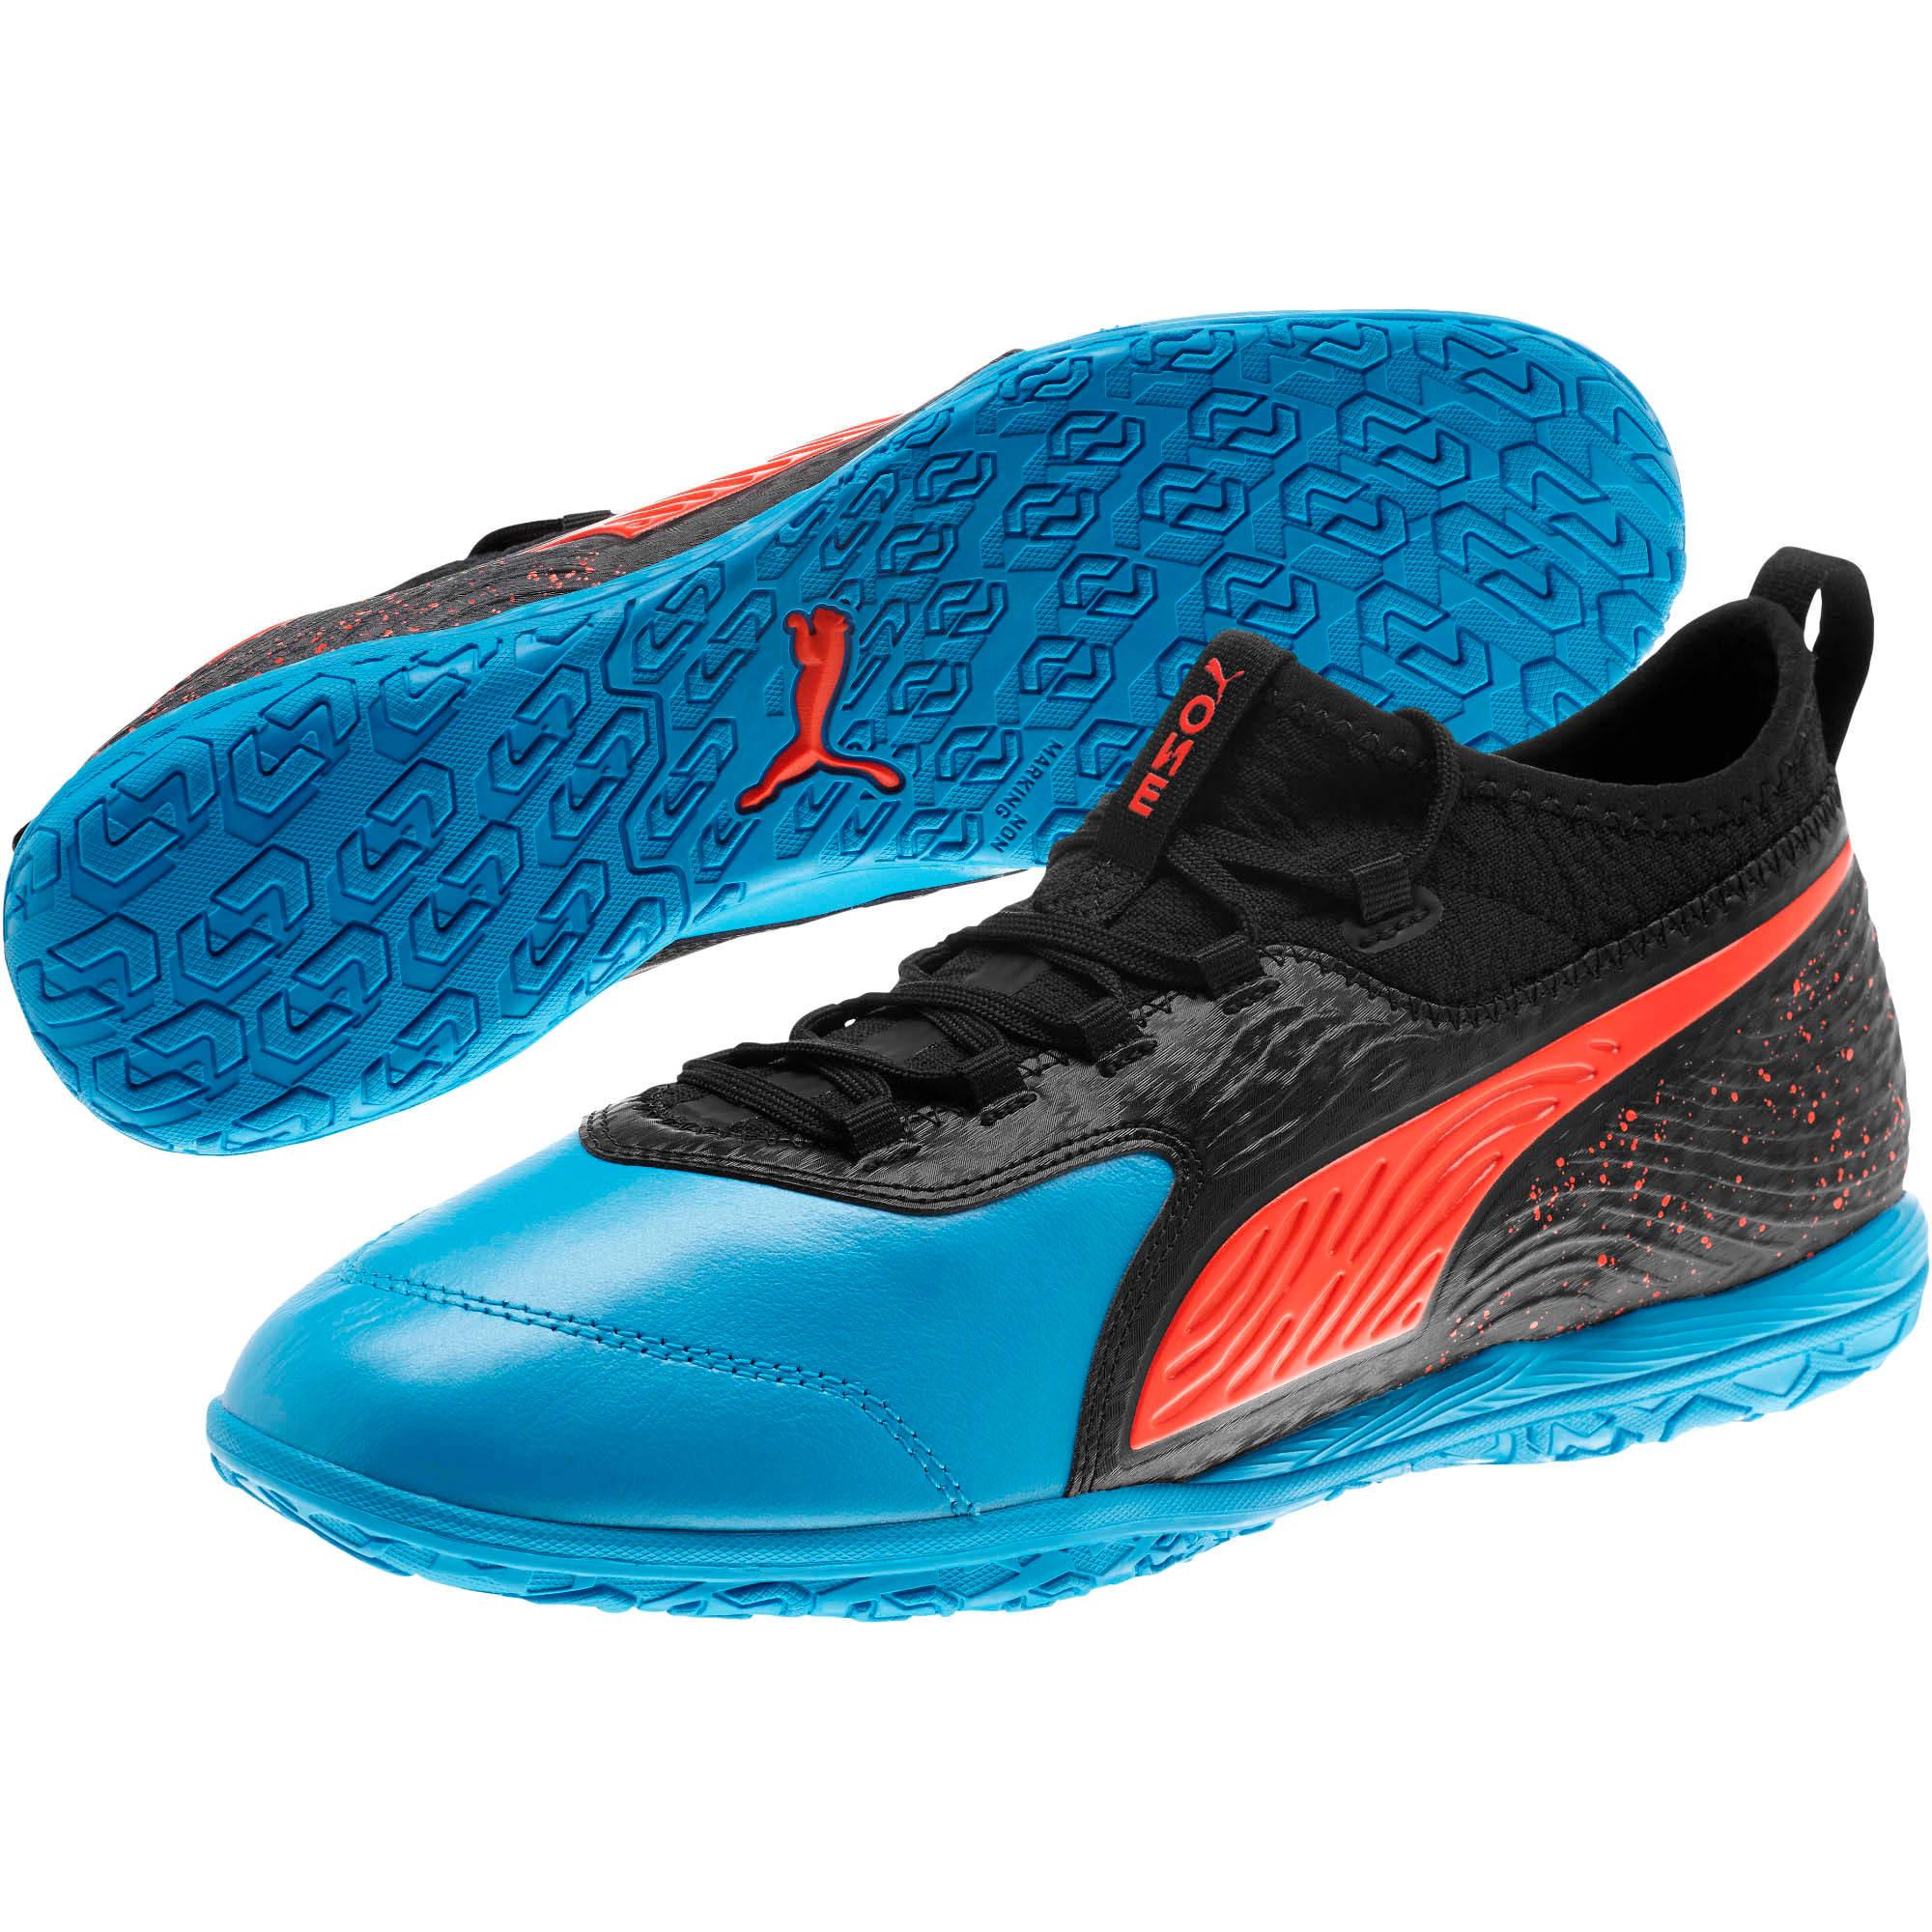 Thumbnail 2 of PUMA ONE 19.3 IT Men's Soccer Shoes, Bleu Azur-Red Blast-Black, medium